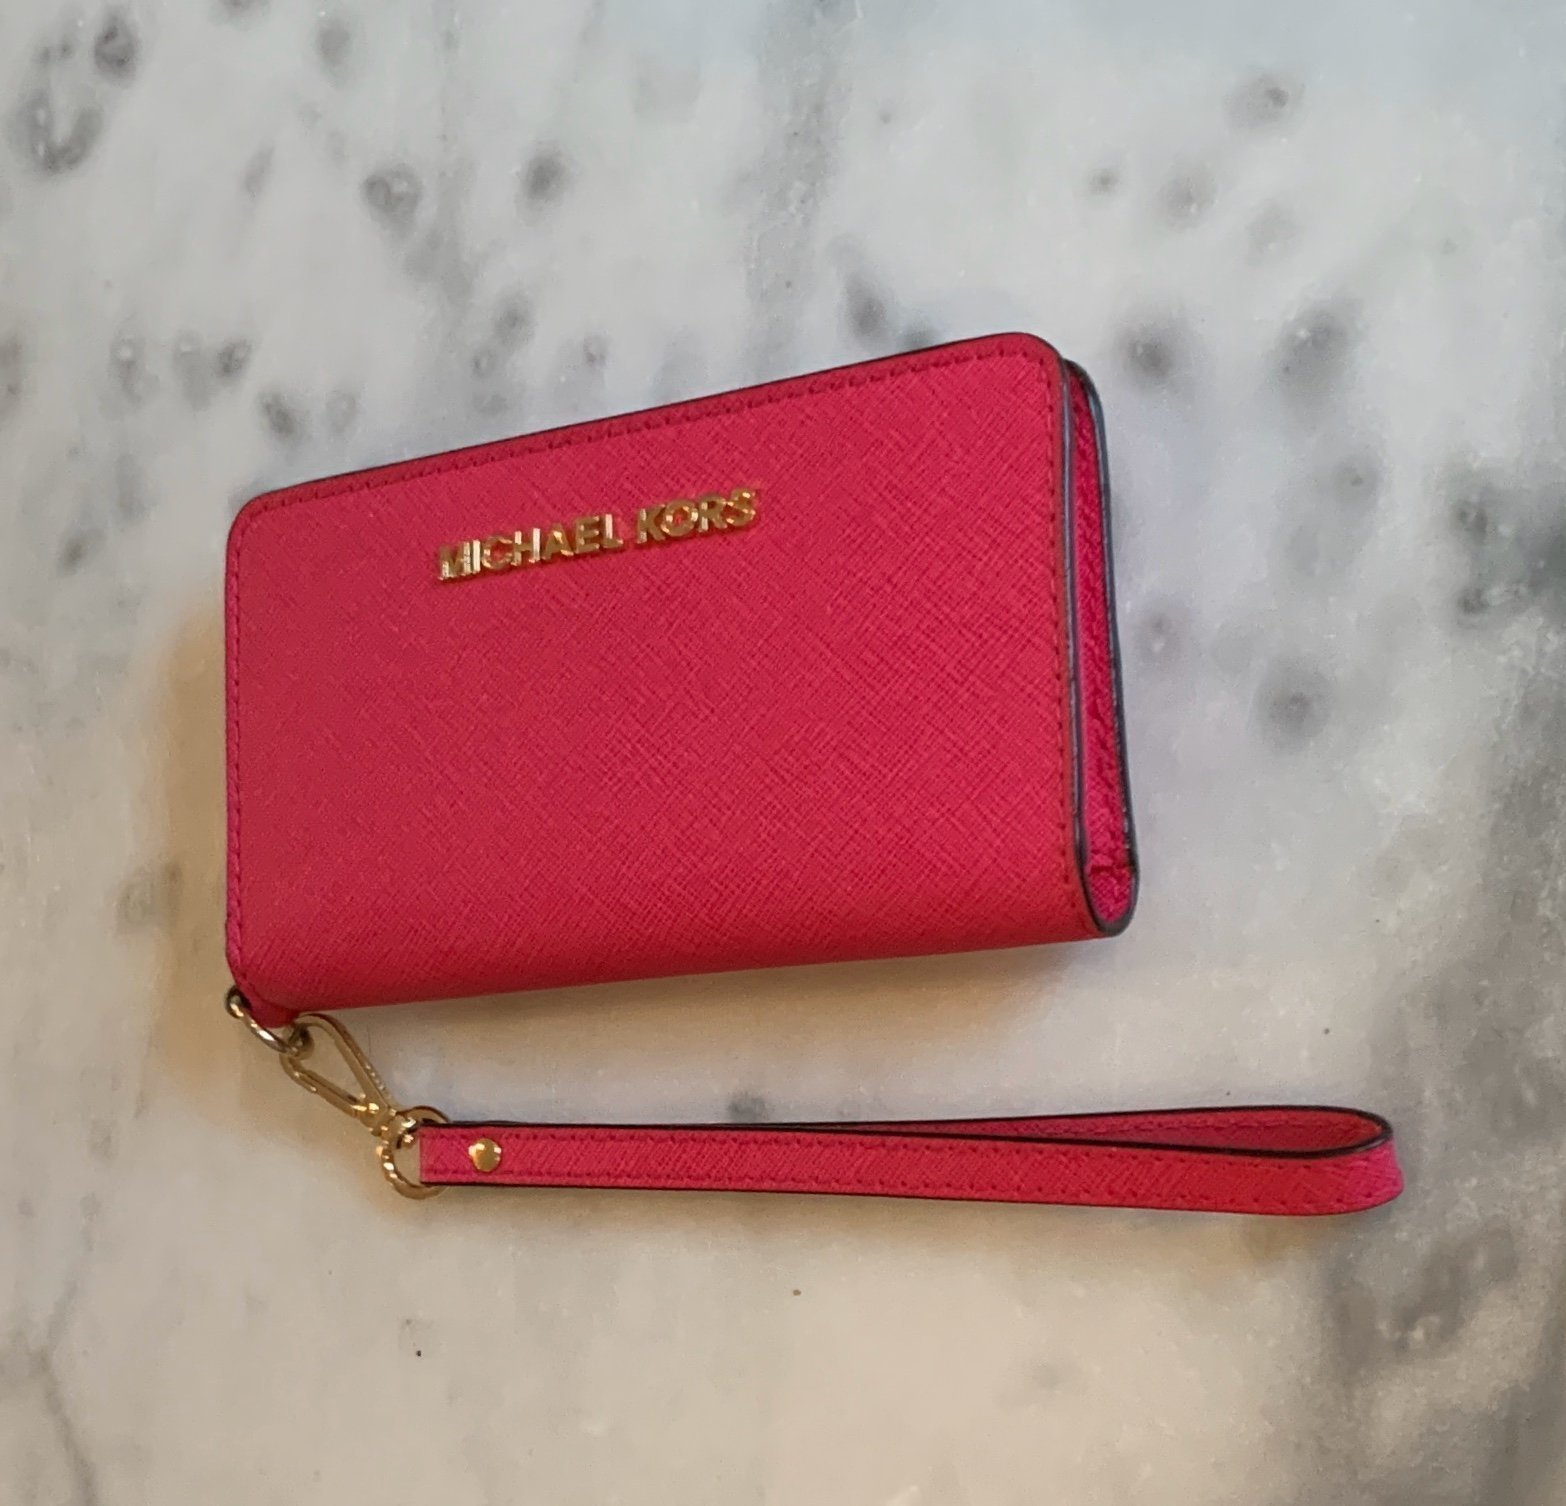 mobil plånbok michael kors